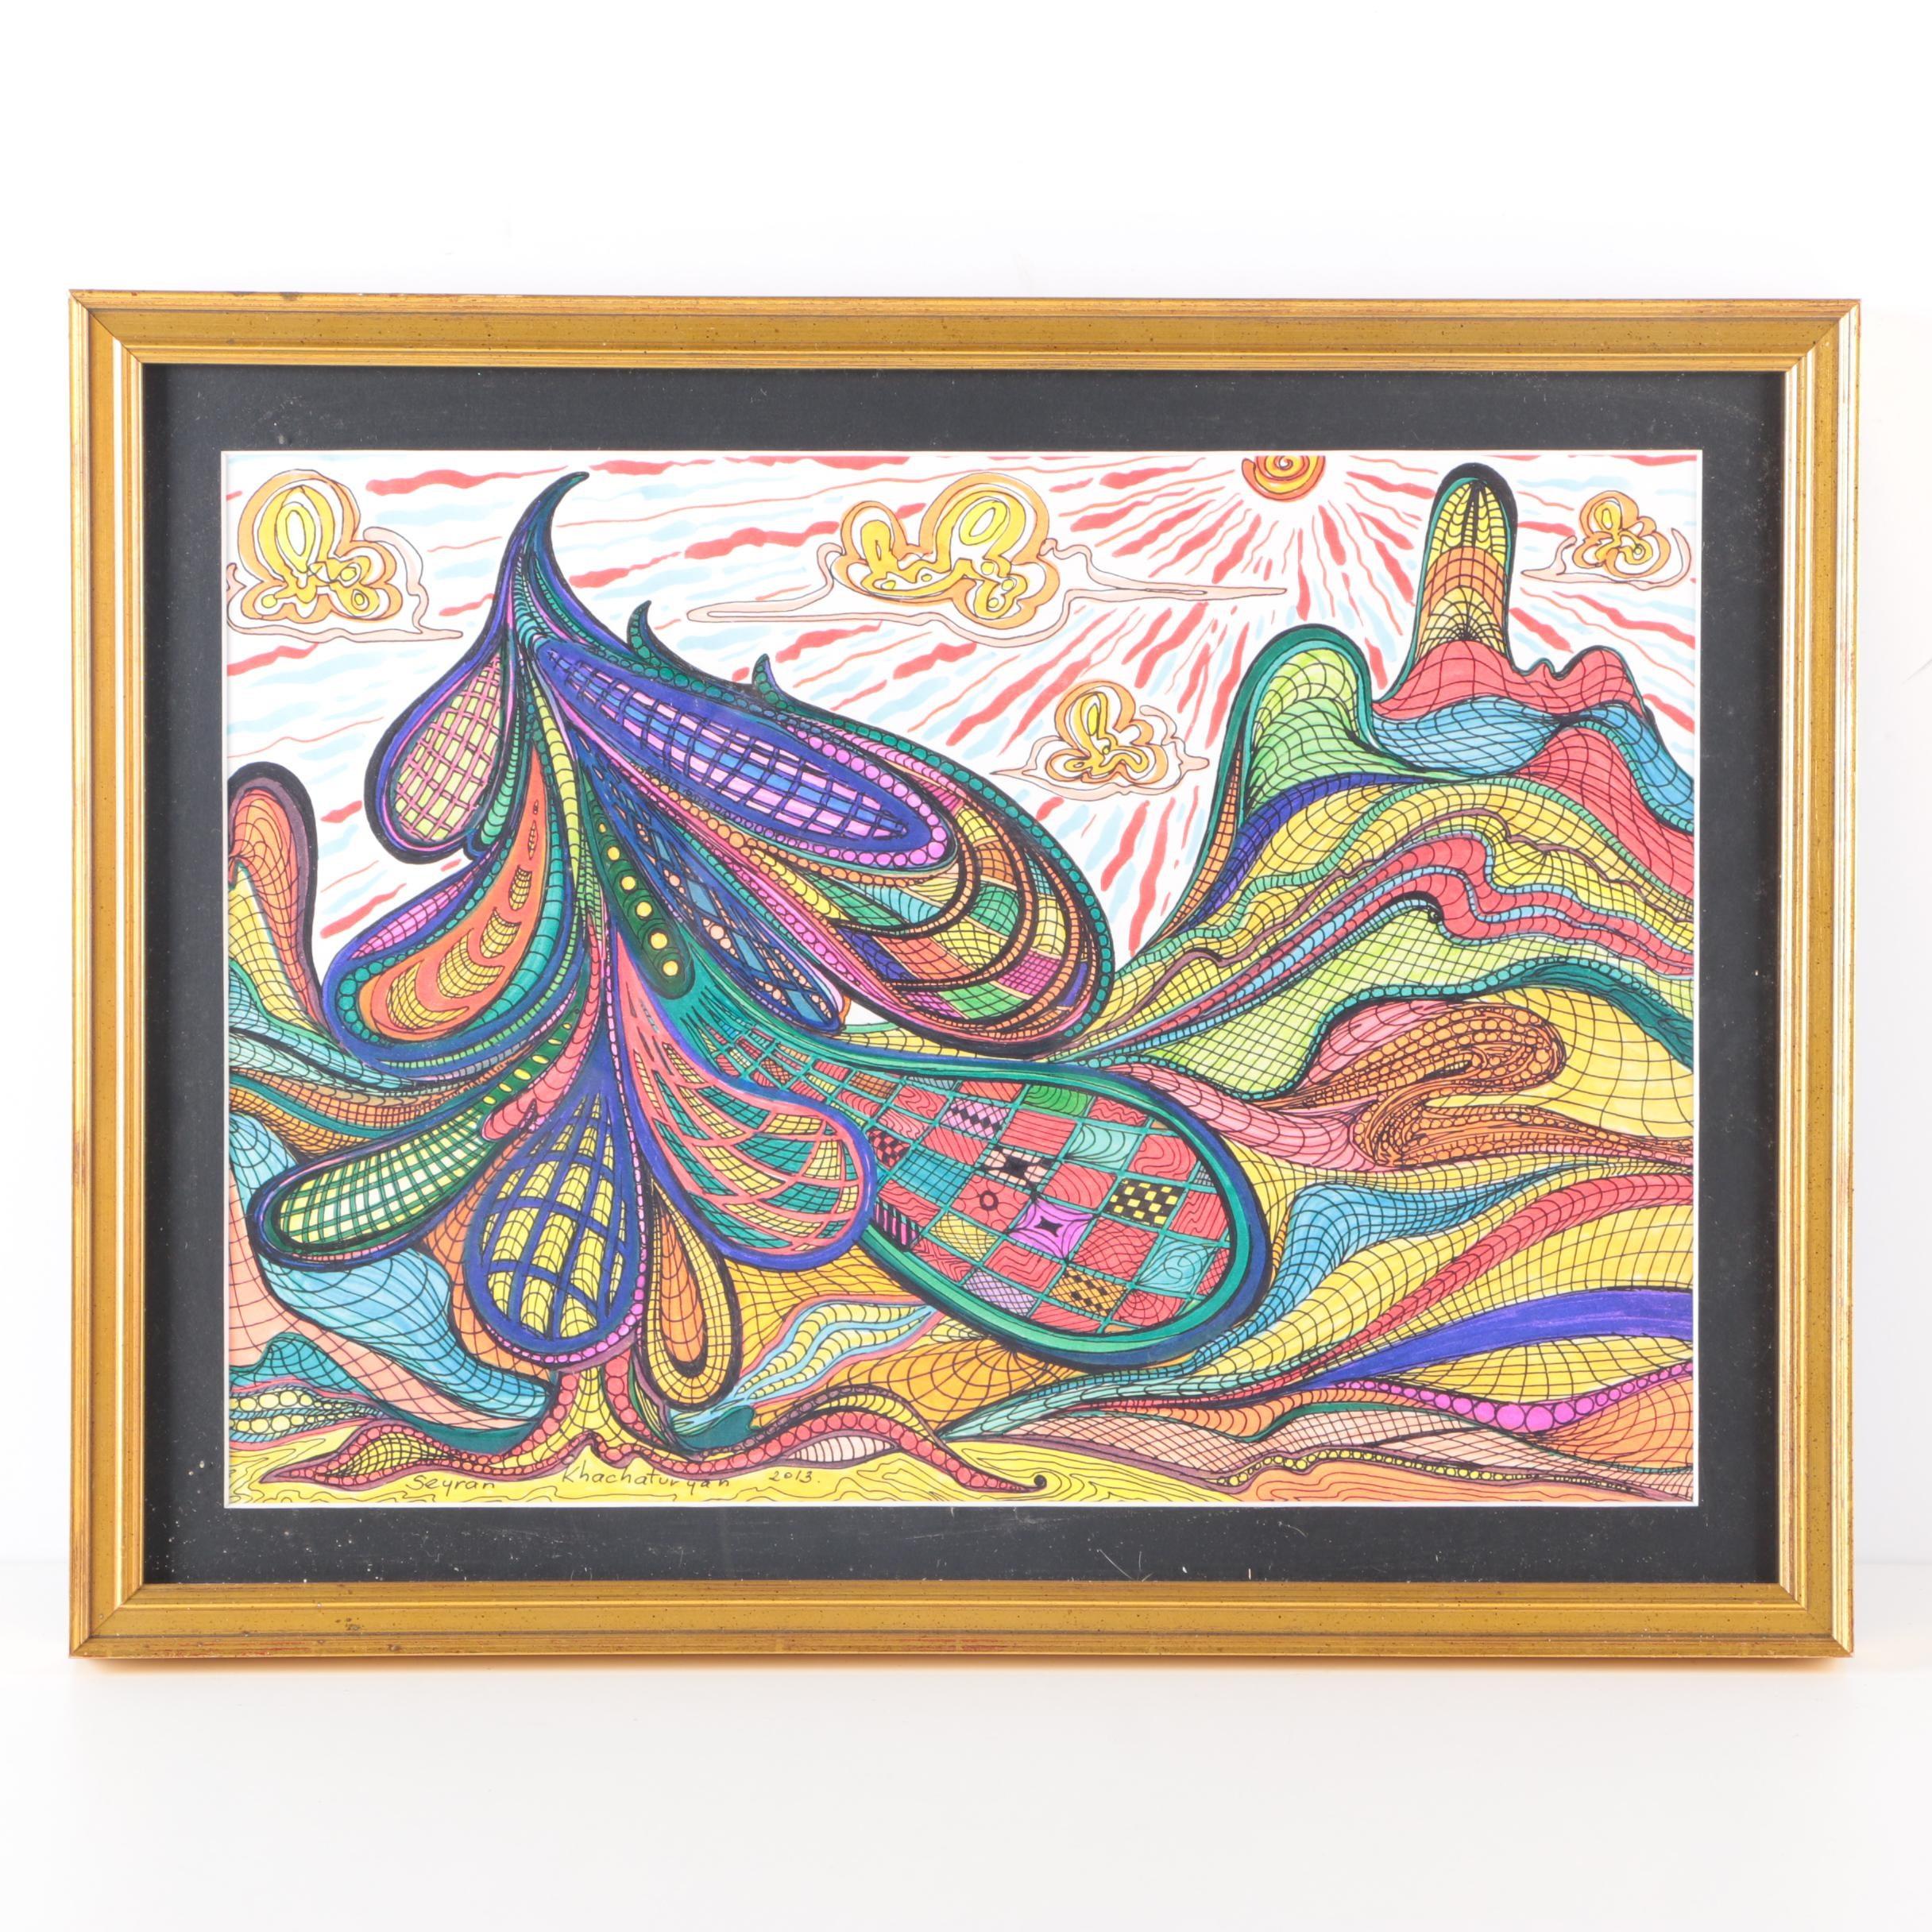 2013 Seyran Khachaturyan Pen and Ink Drawing on Paper